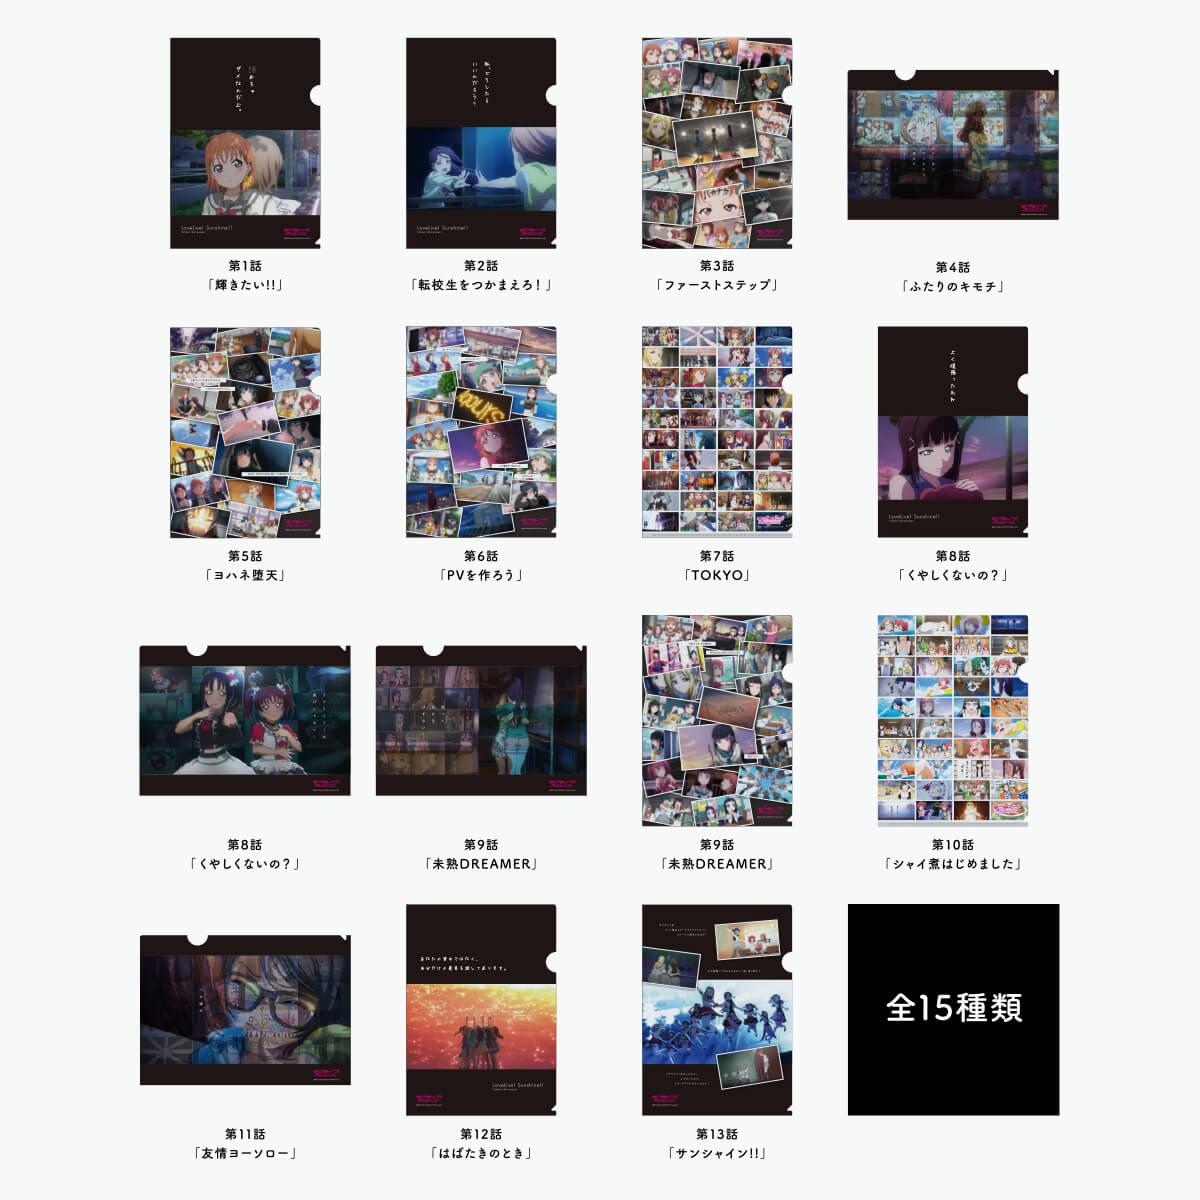 [REFRAIN SERIES]ラブライブ!サンシャイン!!TVシリーズ 1期 名場面クリアファイル 【全15種】